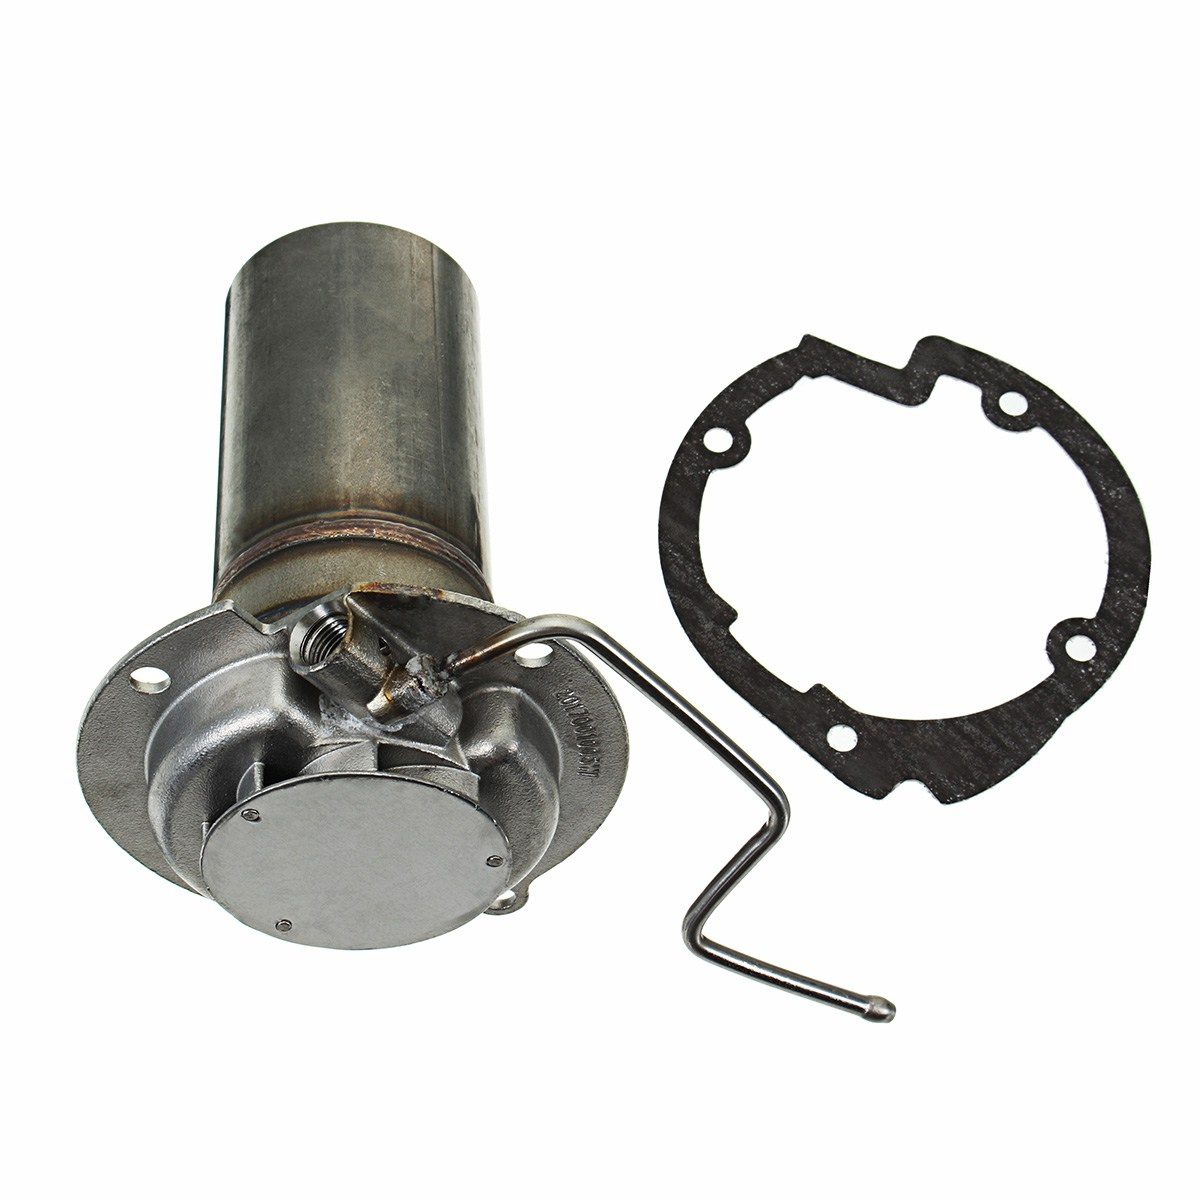 Aparcamiento calentador quemador insertar antorchas combustión con Juntas para eberspacher airtronic D4 d4s 252113100100